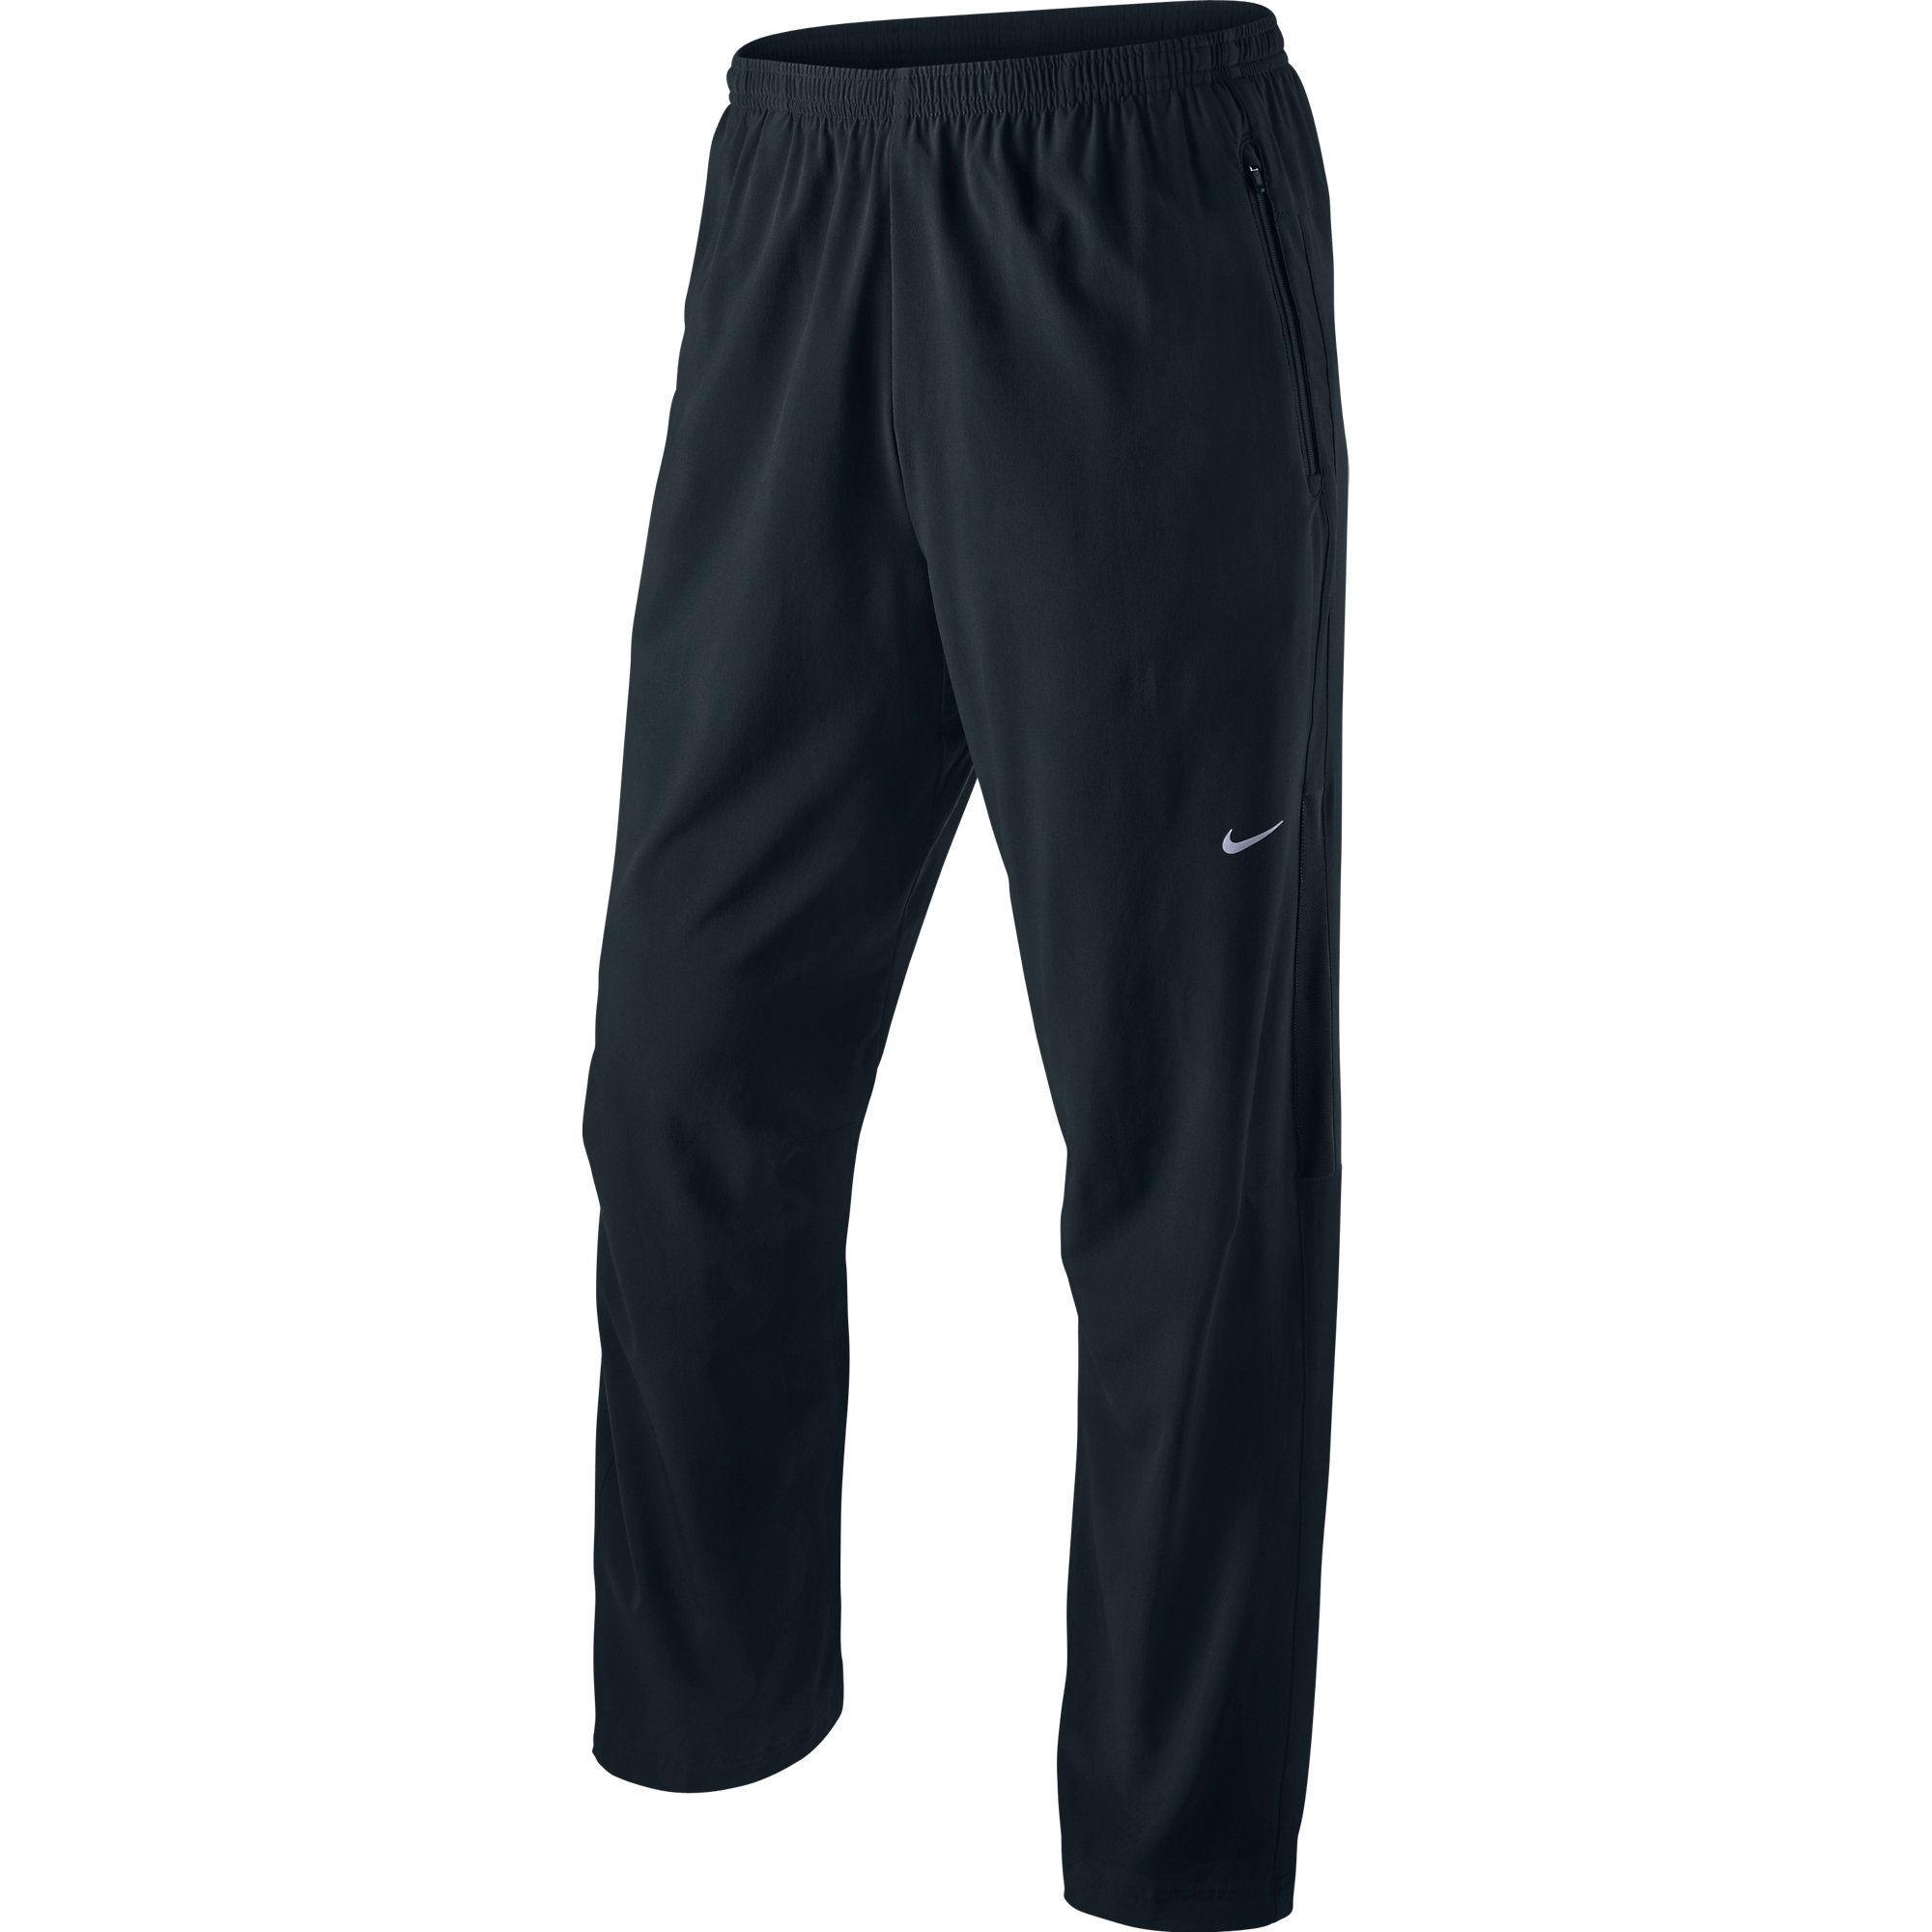 Foto Pantalón Nike - Stretch Woven - OI12 - Extra Large Black/Green/Silver